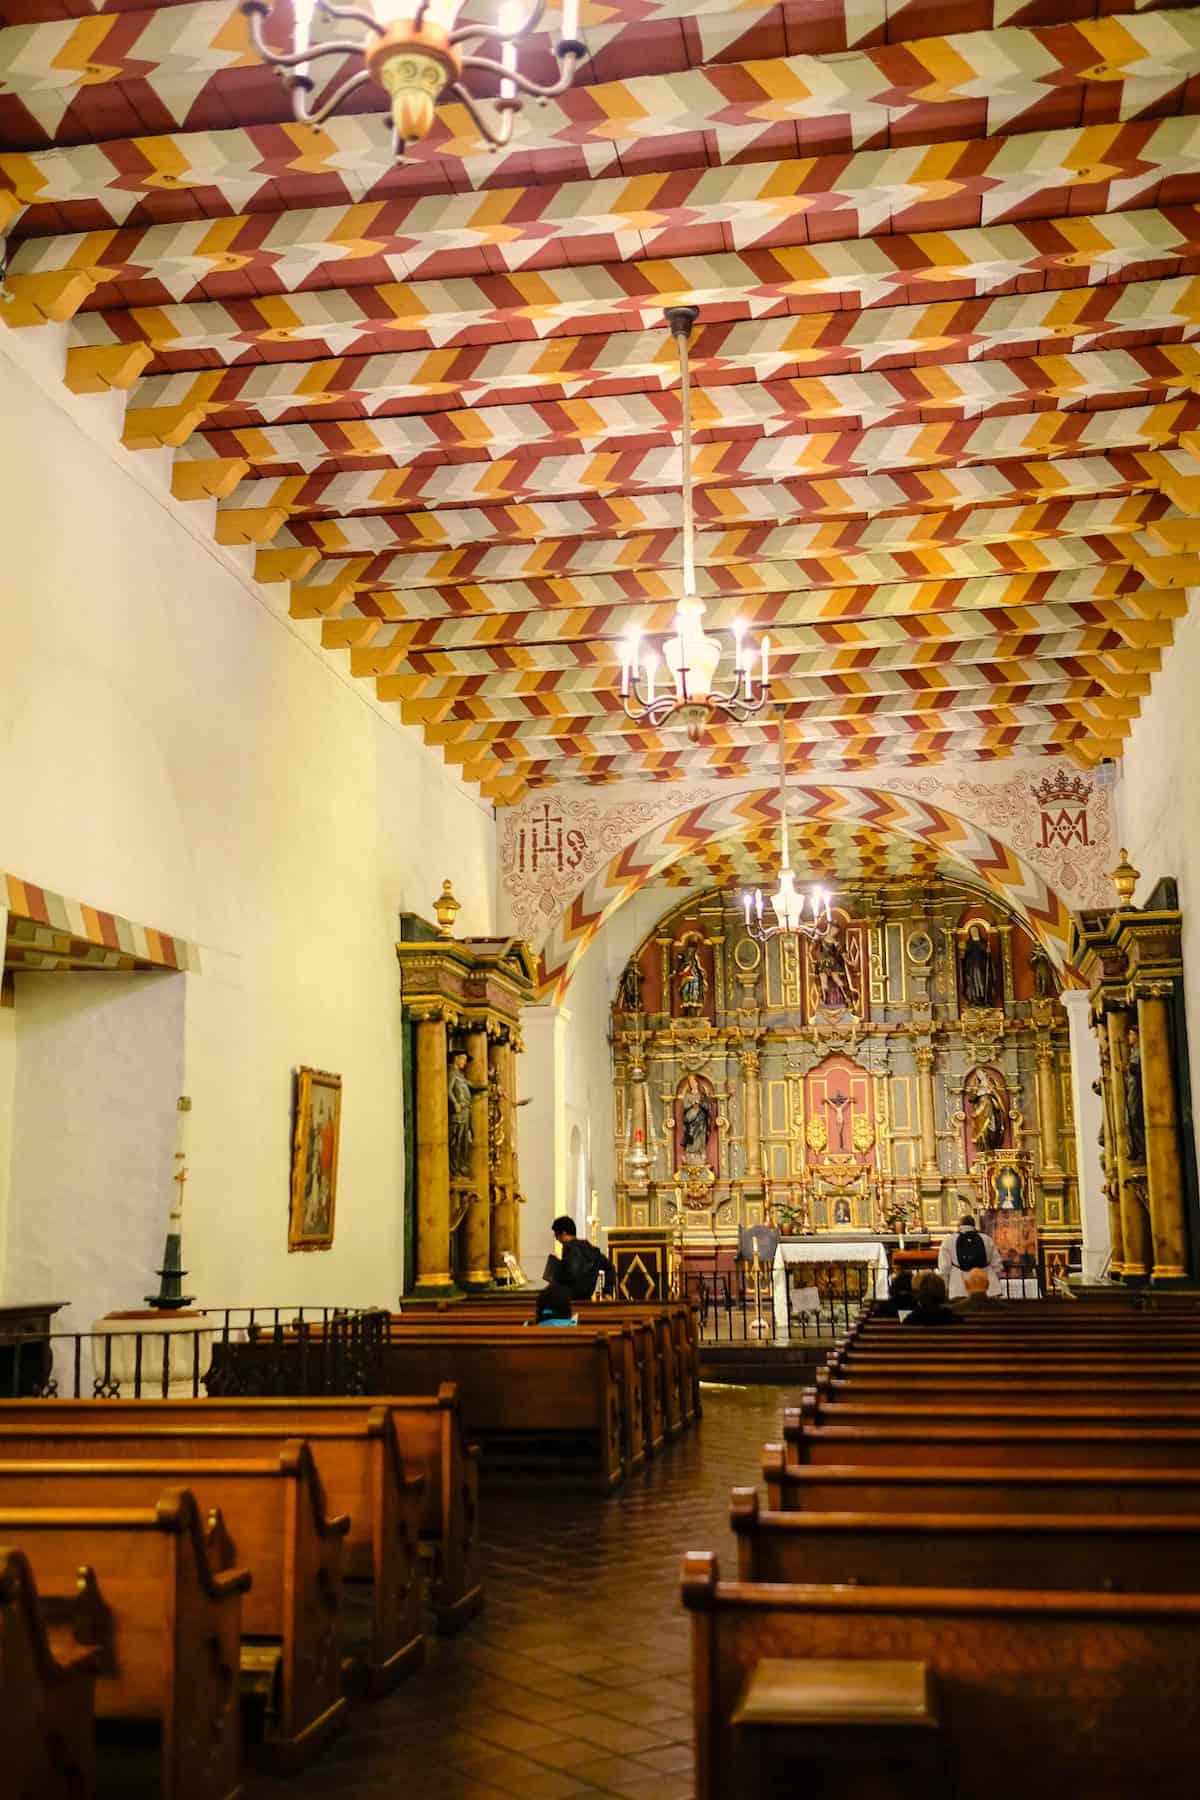 Mission Dolores San Francisco old chapel interior looking toward altar